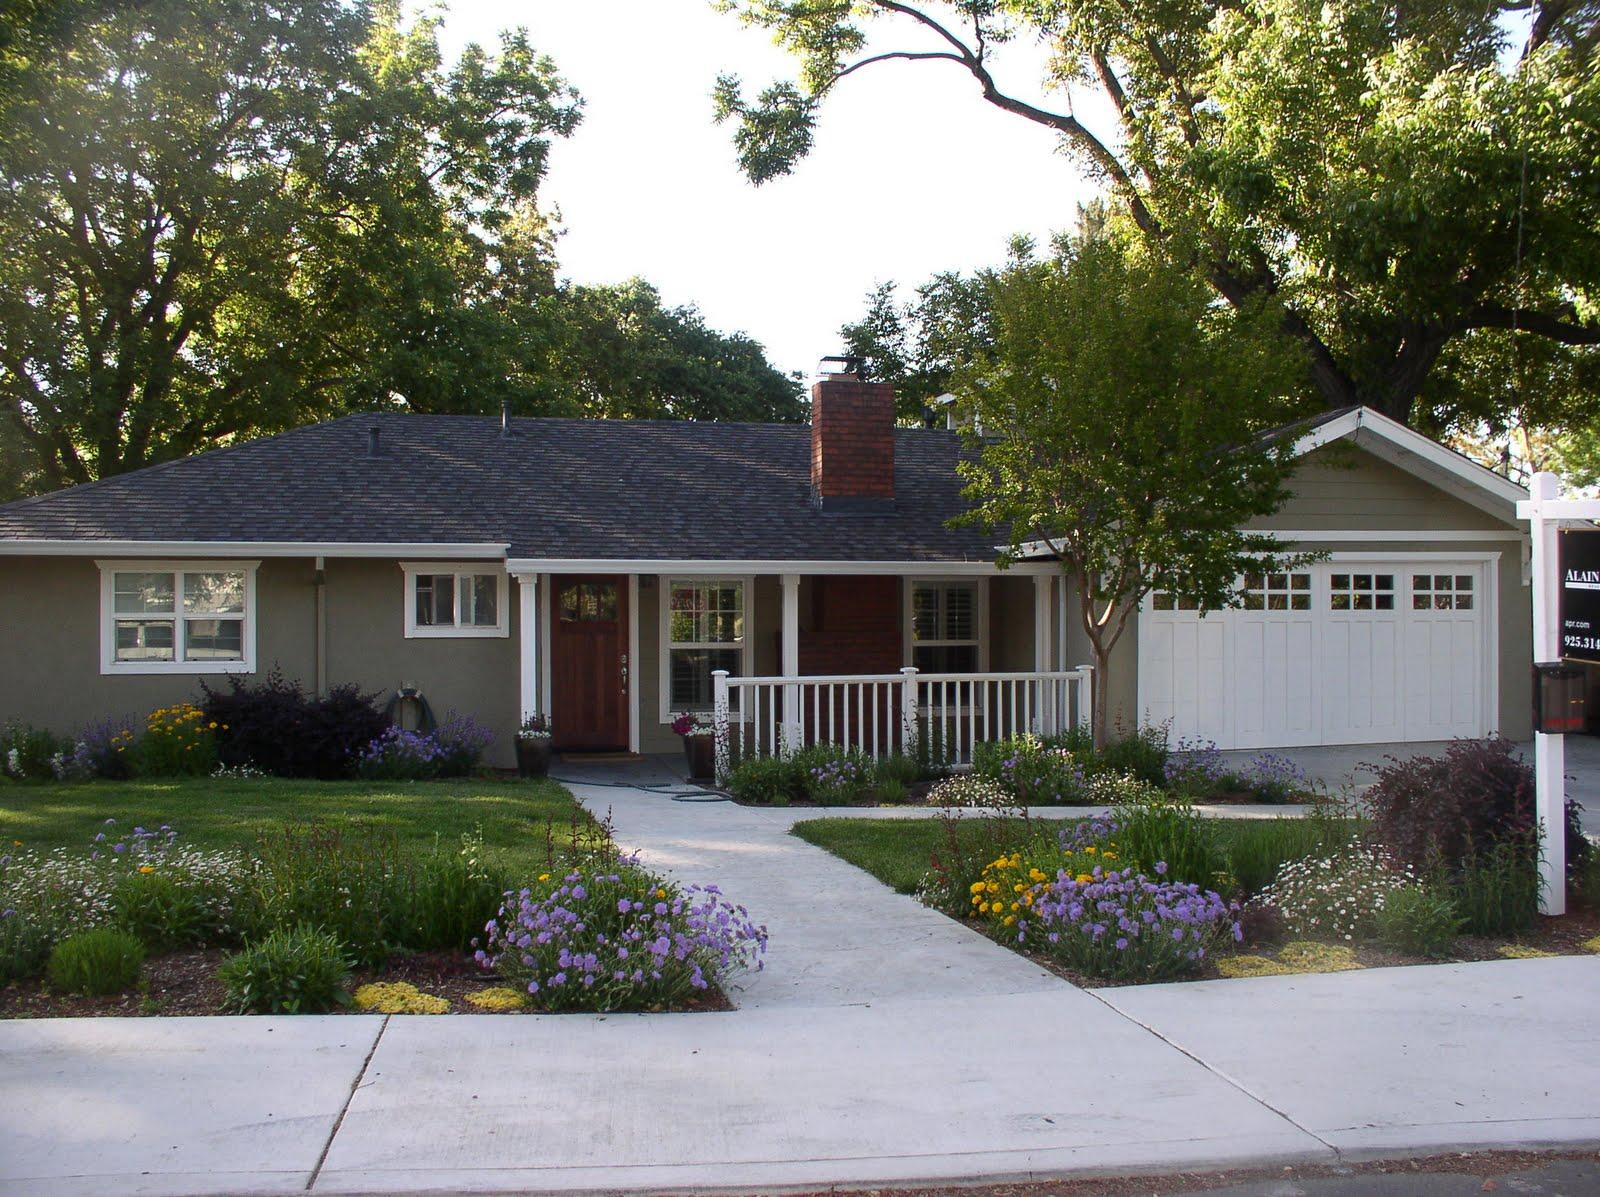 exterior paint colors for house photo - 1